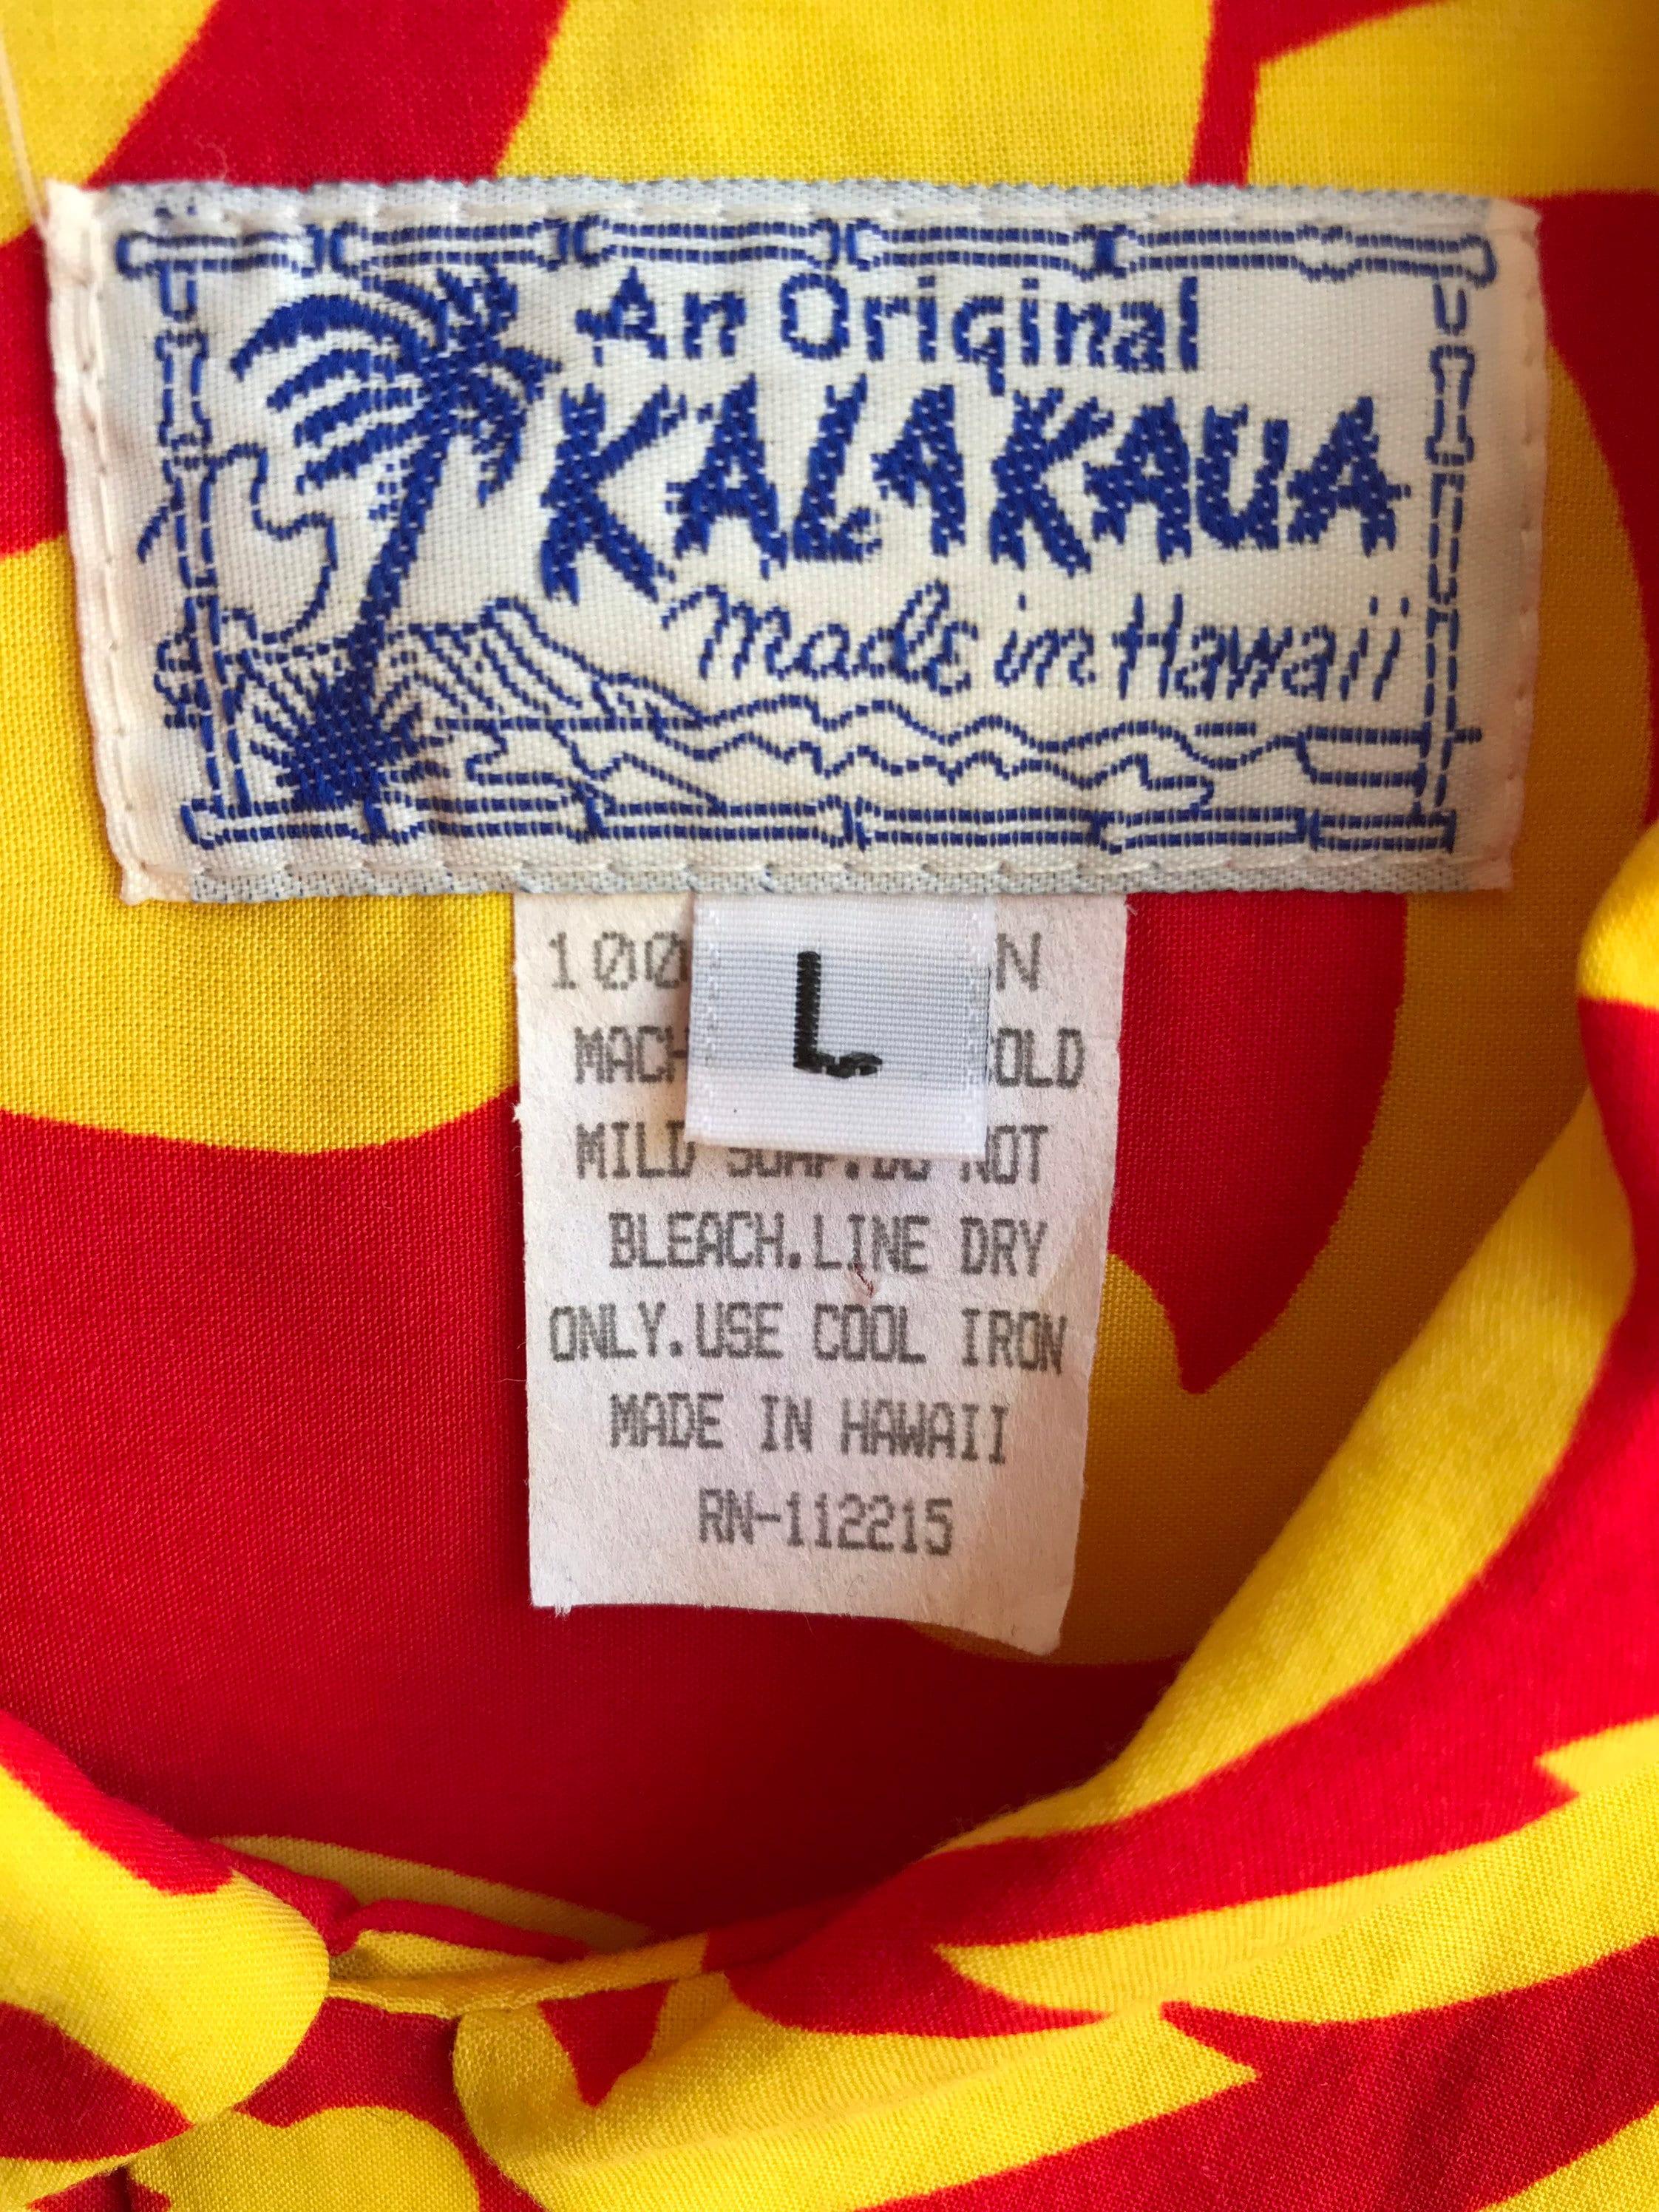 1950s Mens Hats | 50s Vintage Men's Hats Kalakaua Mens Vintage Hawaiian Shirt Bright Bold Vivid Colors Yellow  Red Tiki Style Rayon Made in Hawaii Rockabilly Size Large $20.00 AT vintagedancer.com